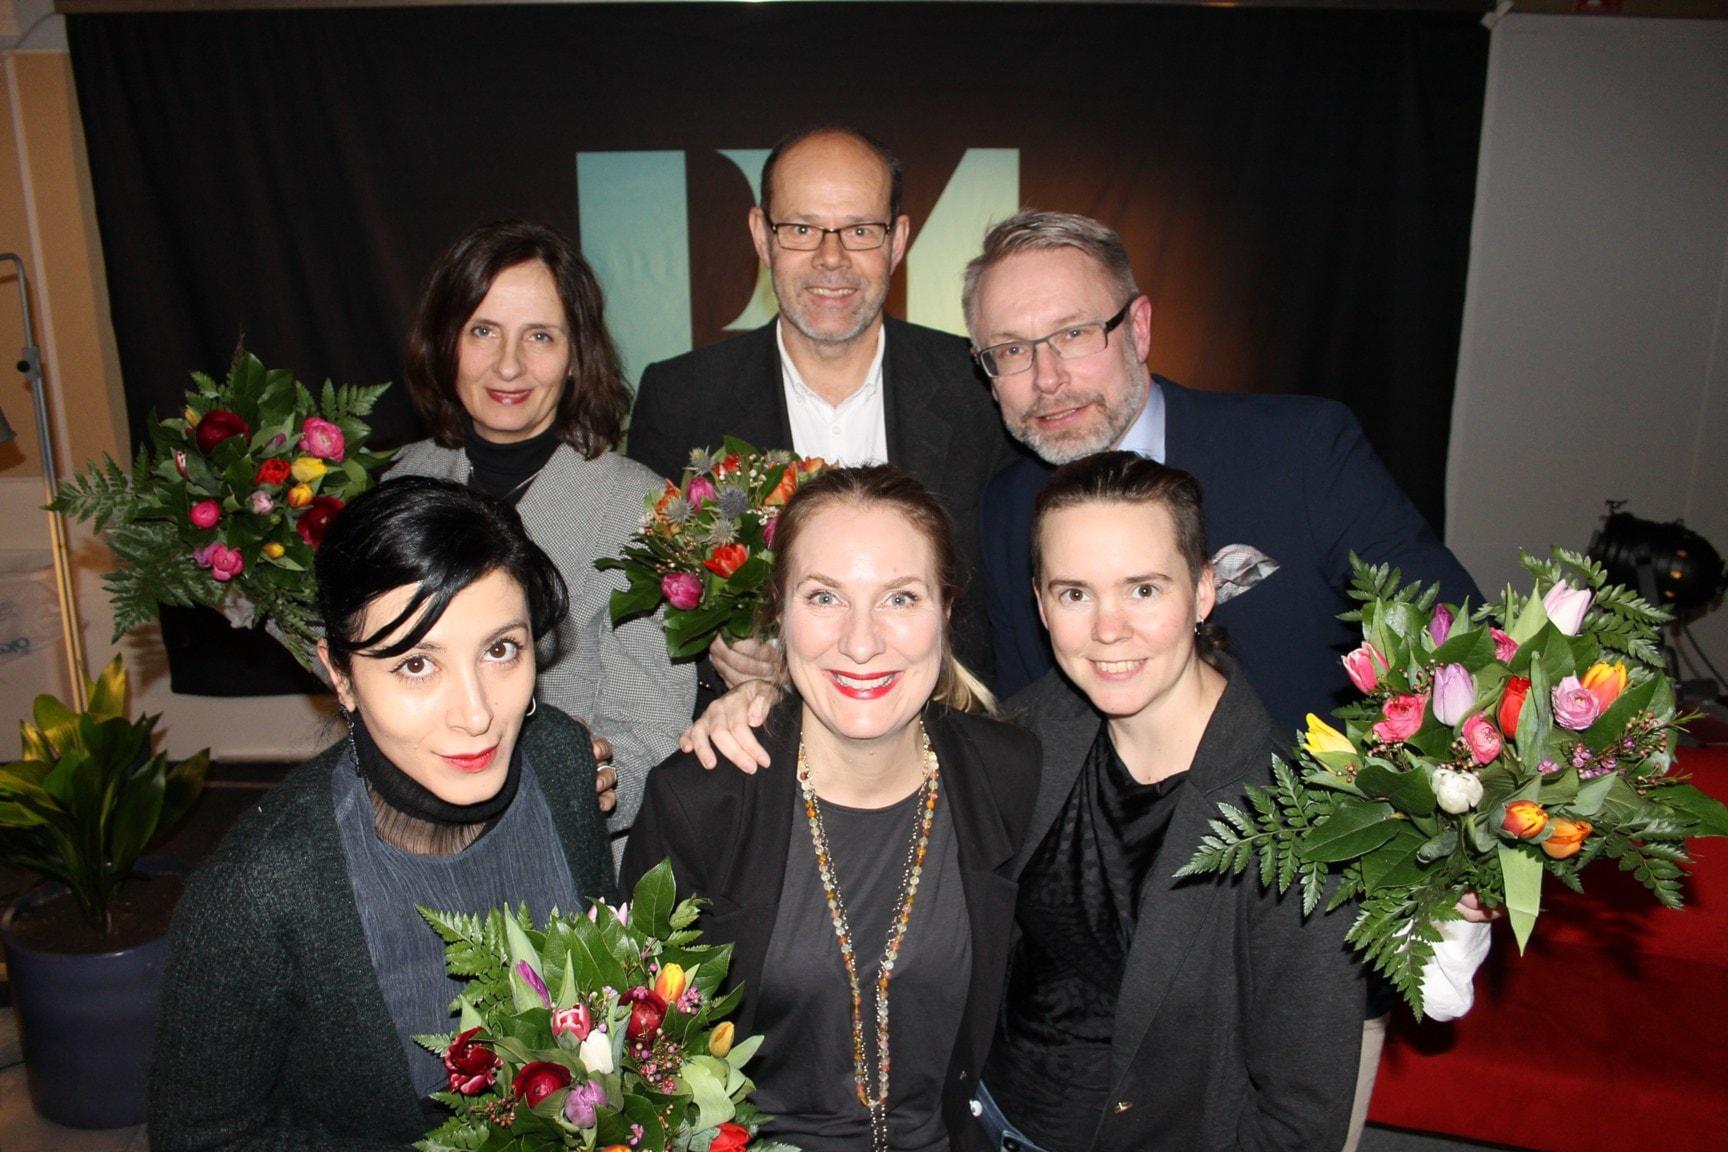 Susanna Alakoski, Sara Abdollahi, Daniel Alling och Dag Malmqvist!